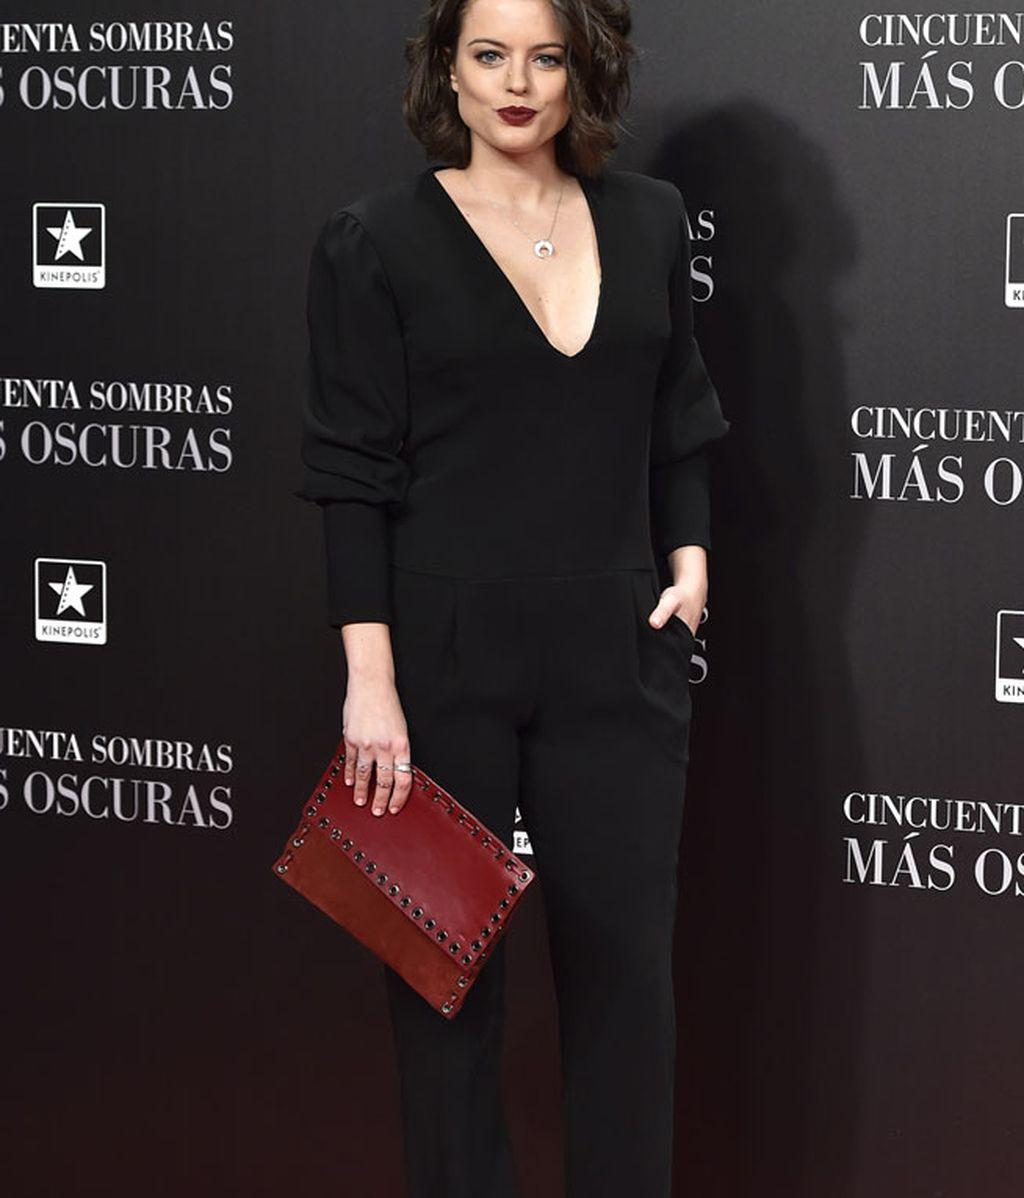 Adriana Torrebejano eligió un sencillo mono negro